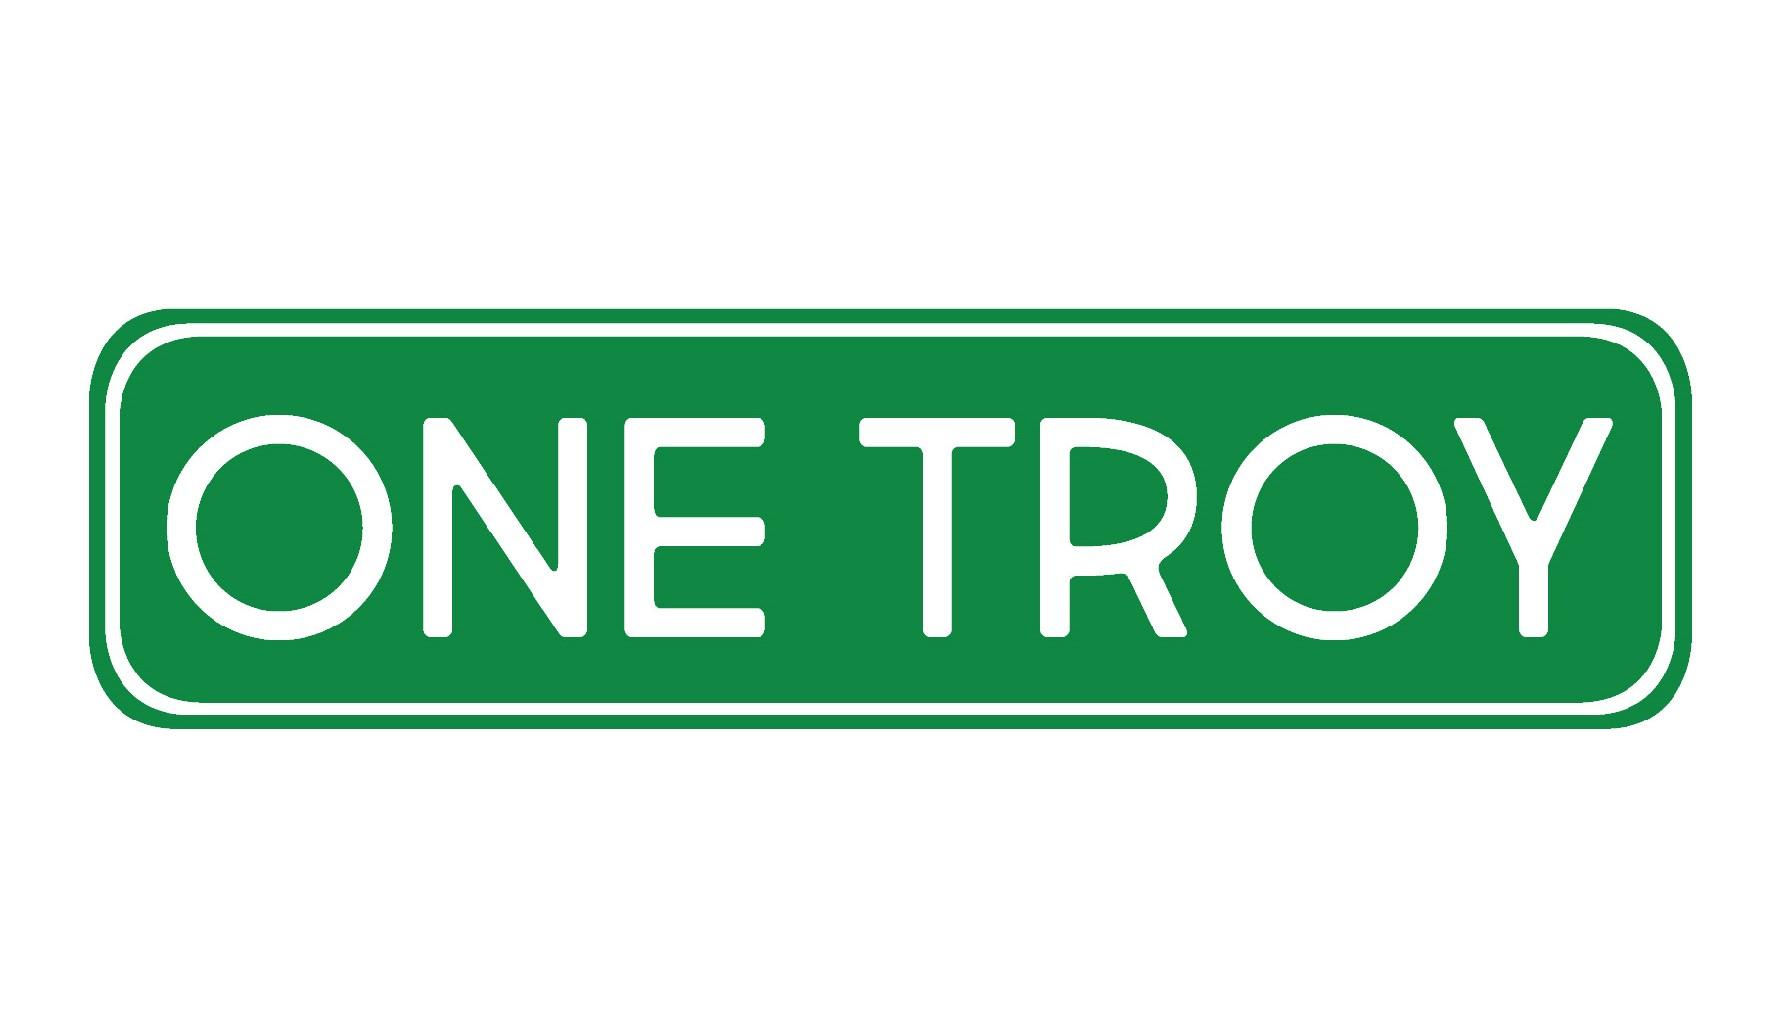 Learn more! - One neighborhood. One community. One Troy.